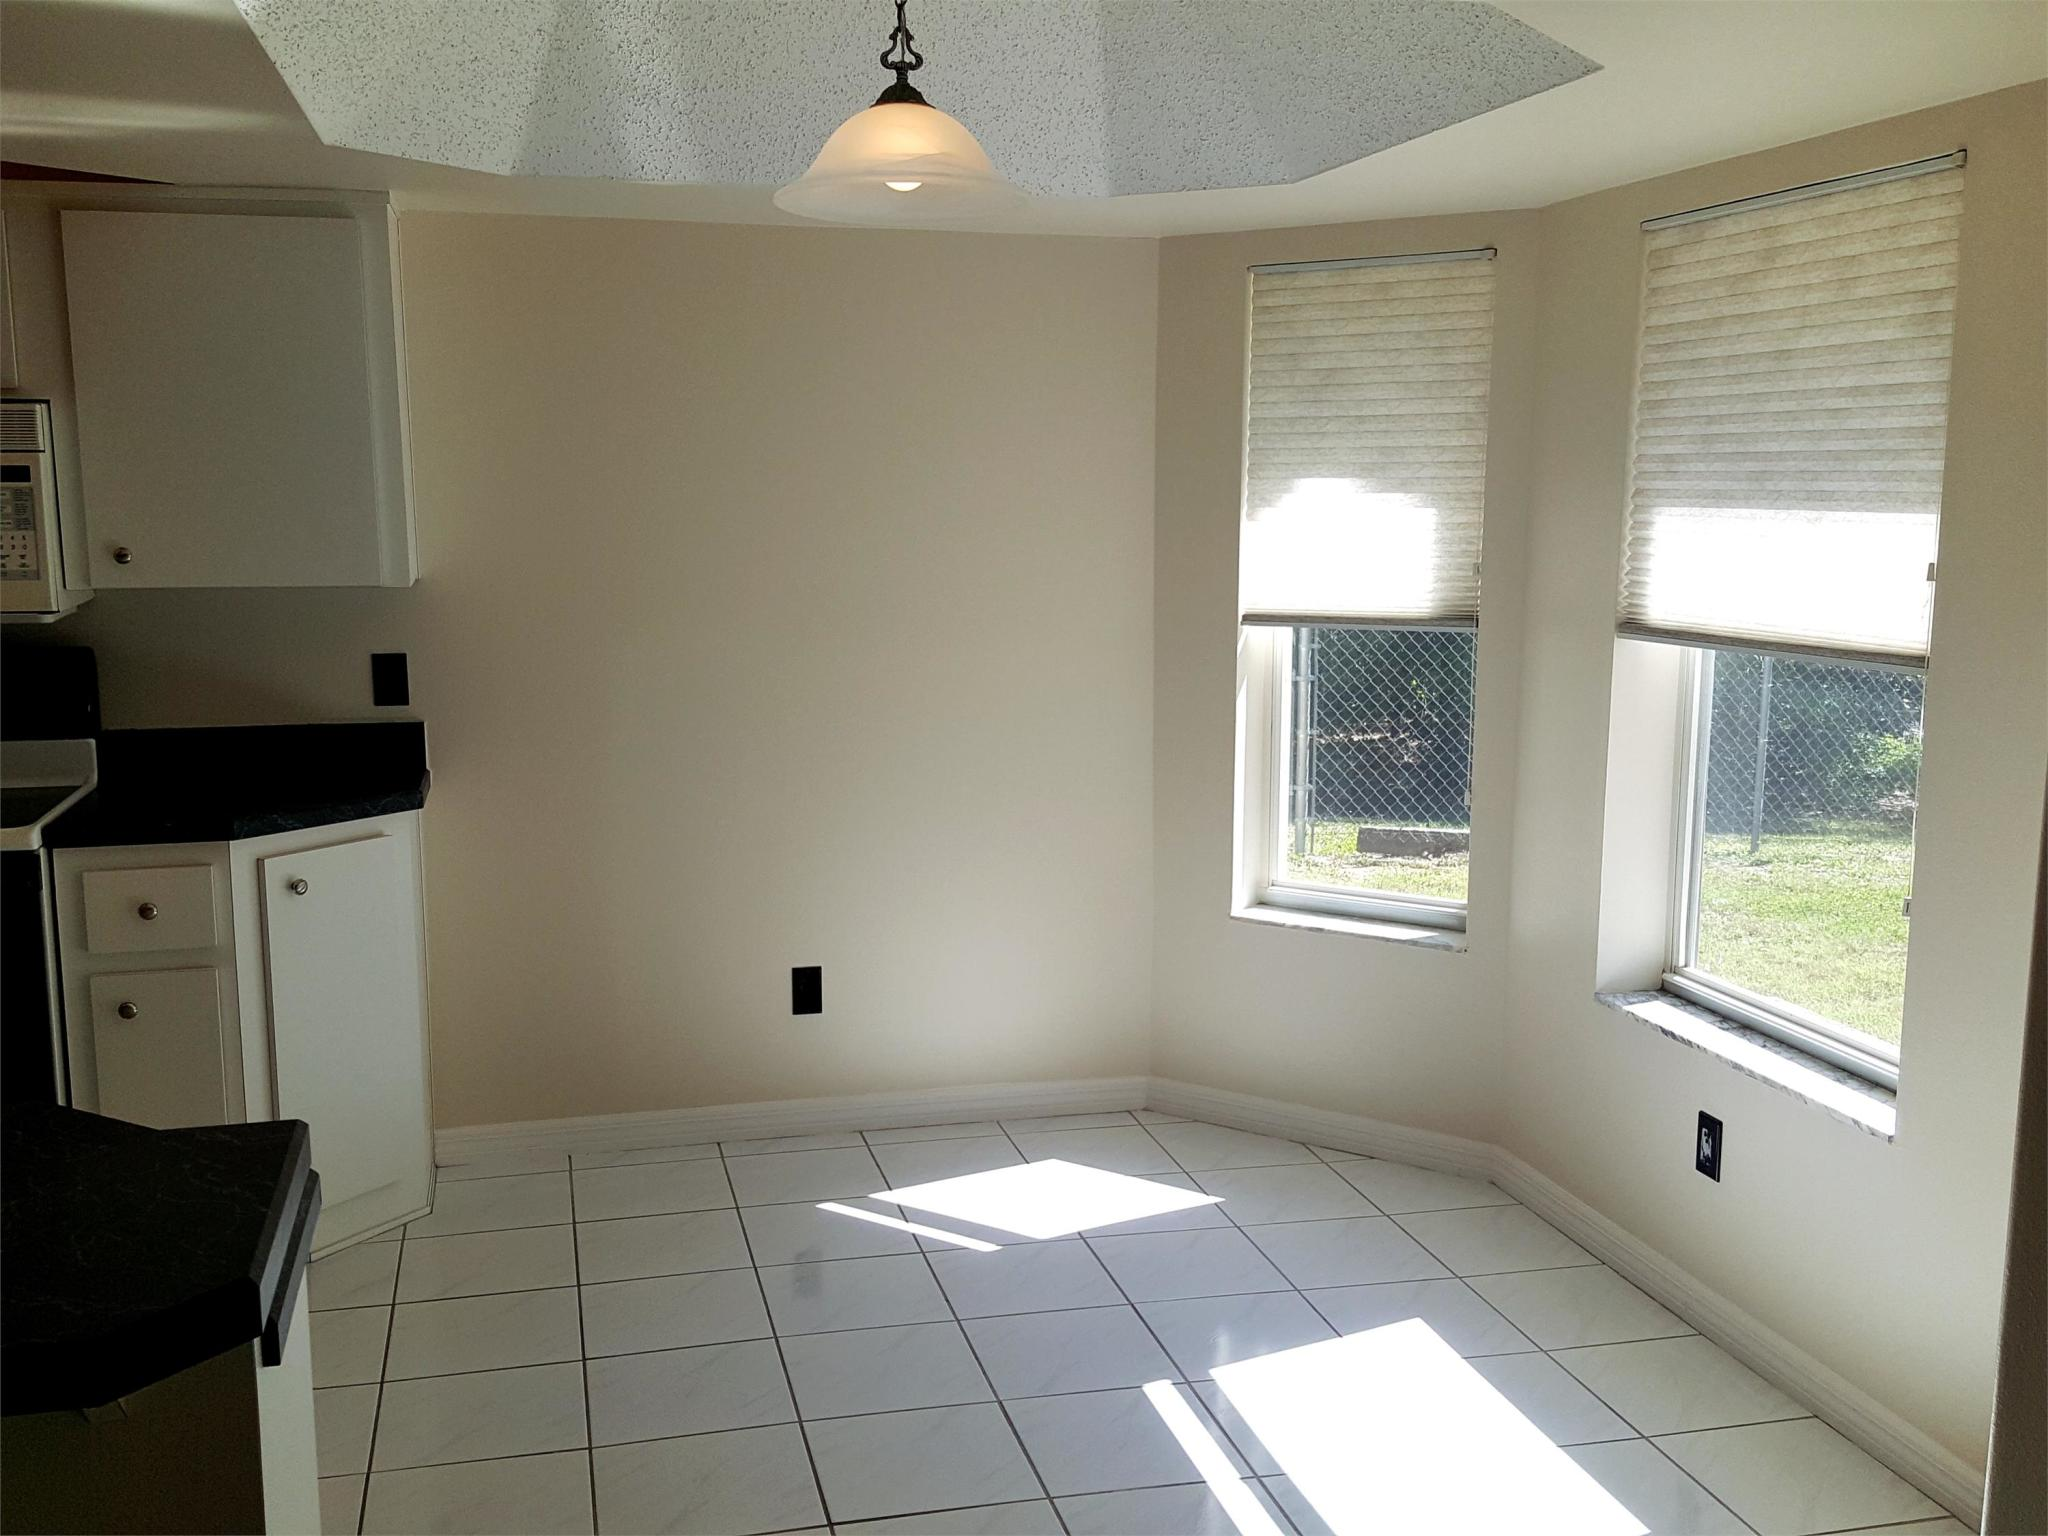 5189 N Teak Way, Beverly Hills, FL 34465 - 3 Bed, 3 Bath